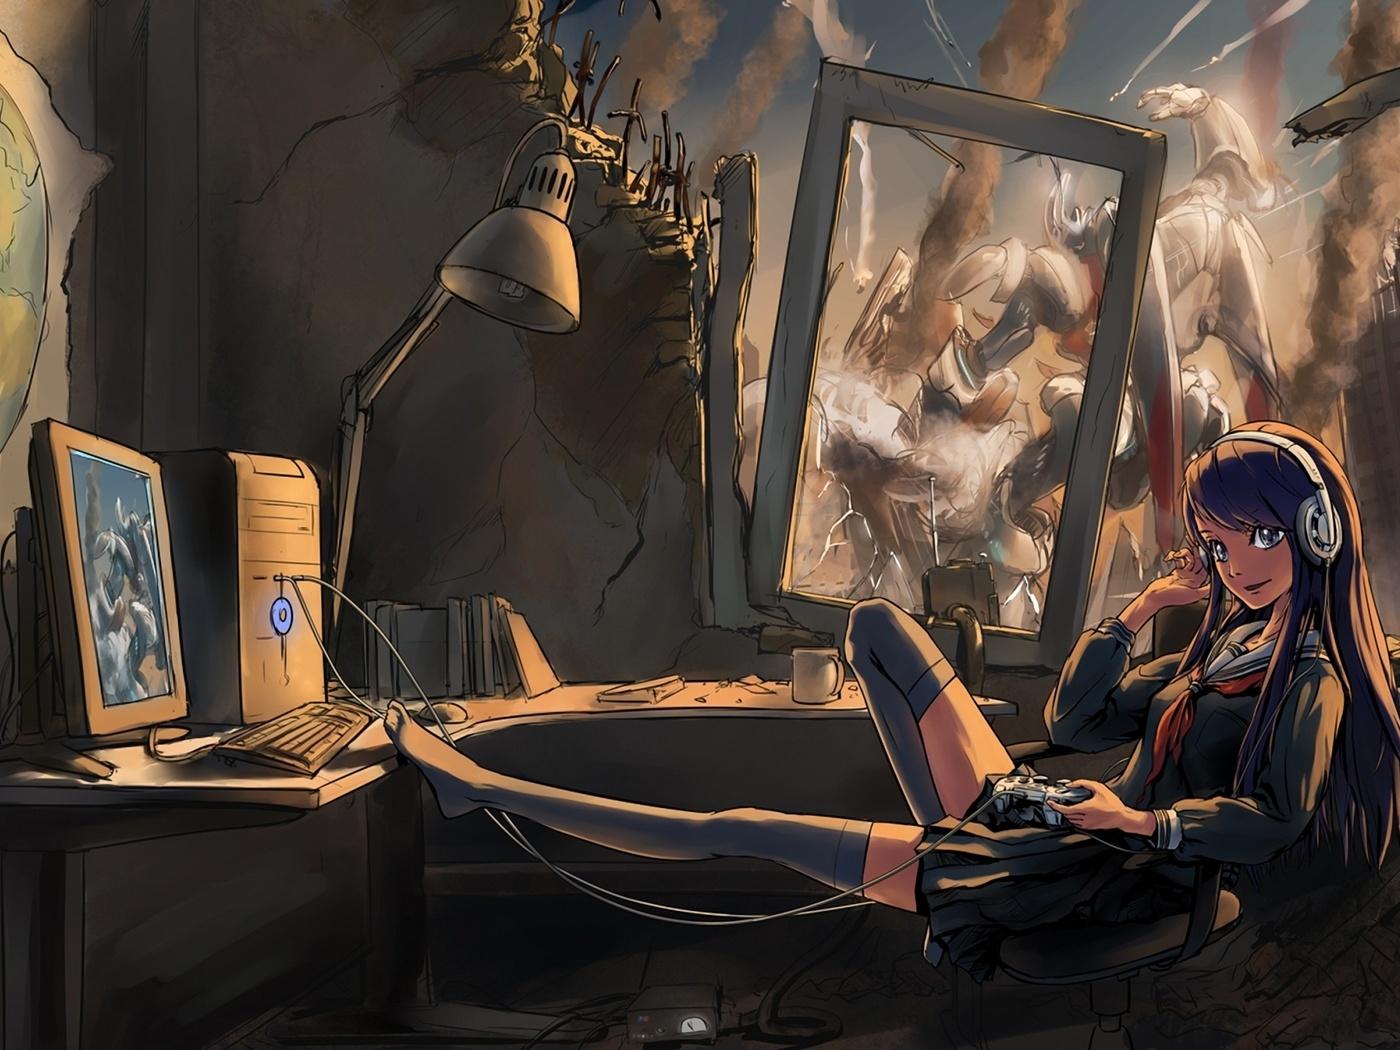 Картинка на рабочий стол на тему меха, джойстик, наушники, девушка